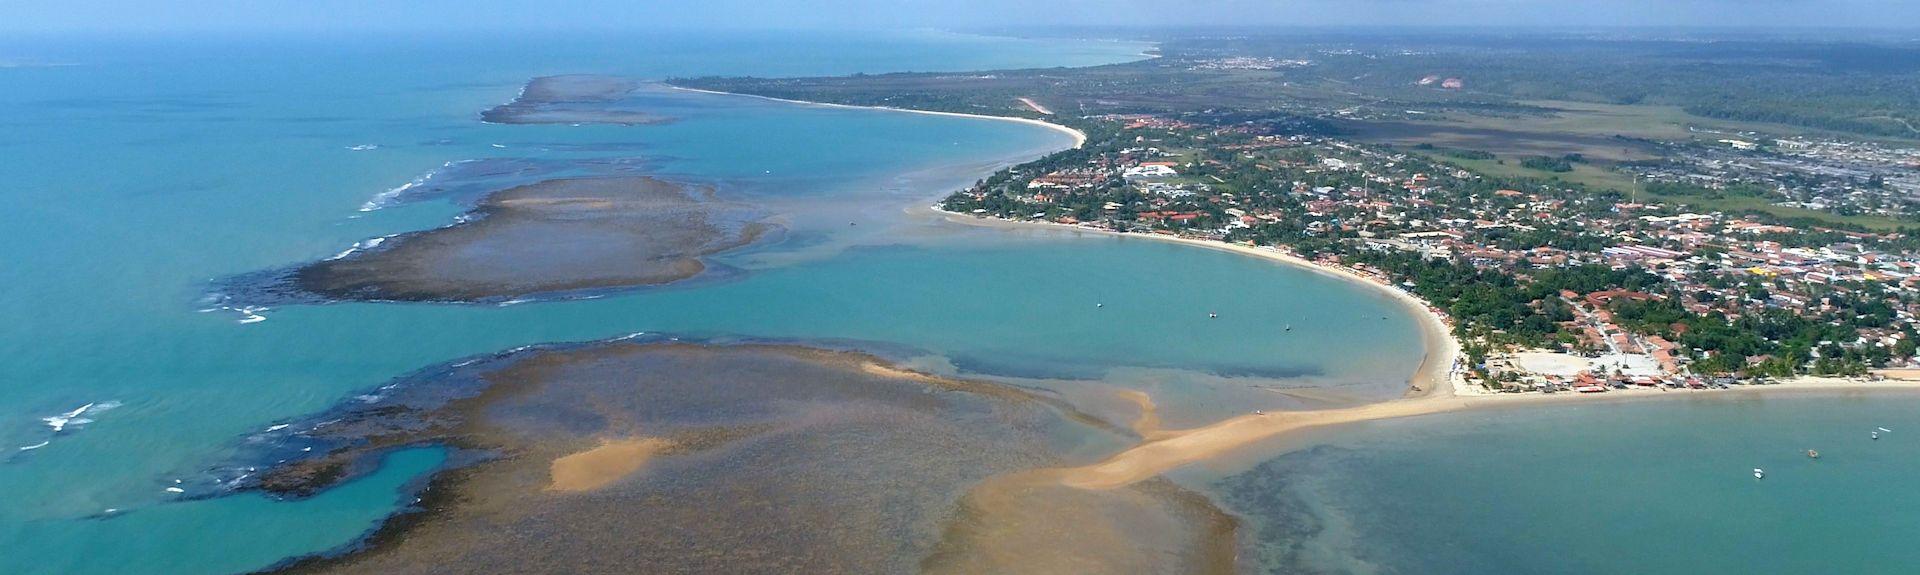 Coroa Vermelha Cross, Santa Cruz Cabralia, Bahia State, Brazil